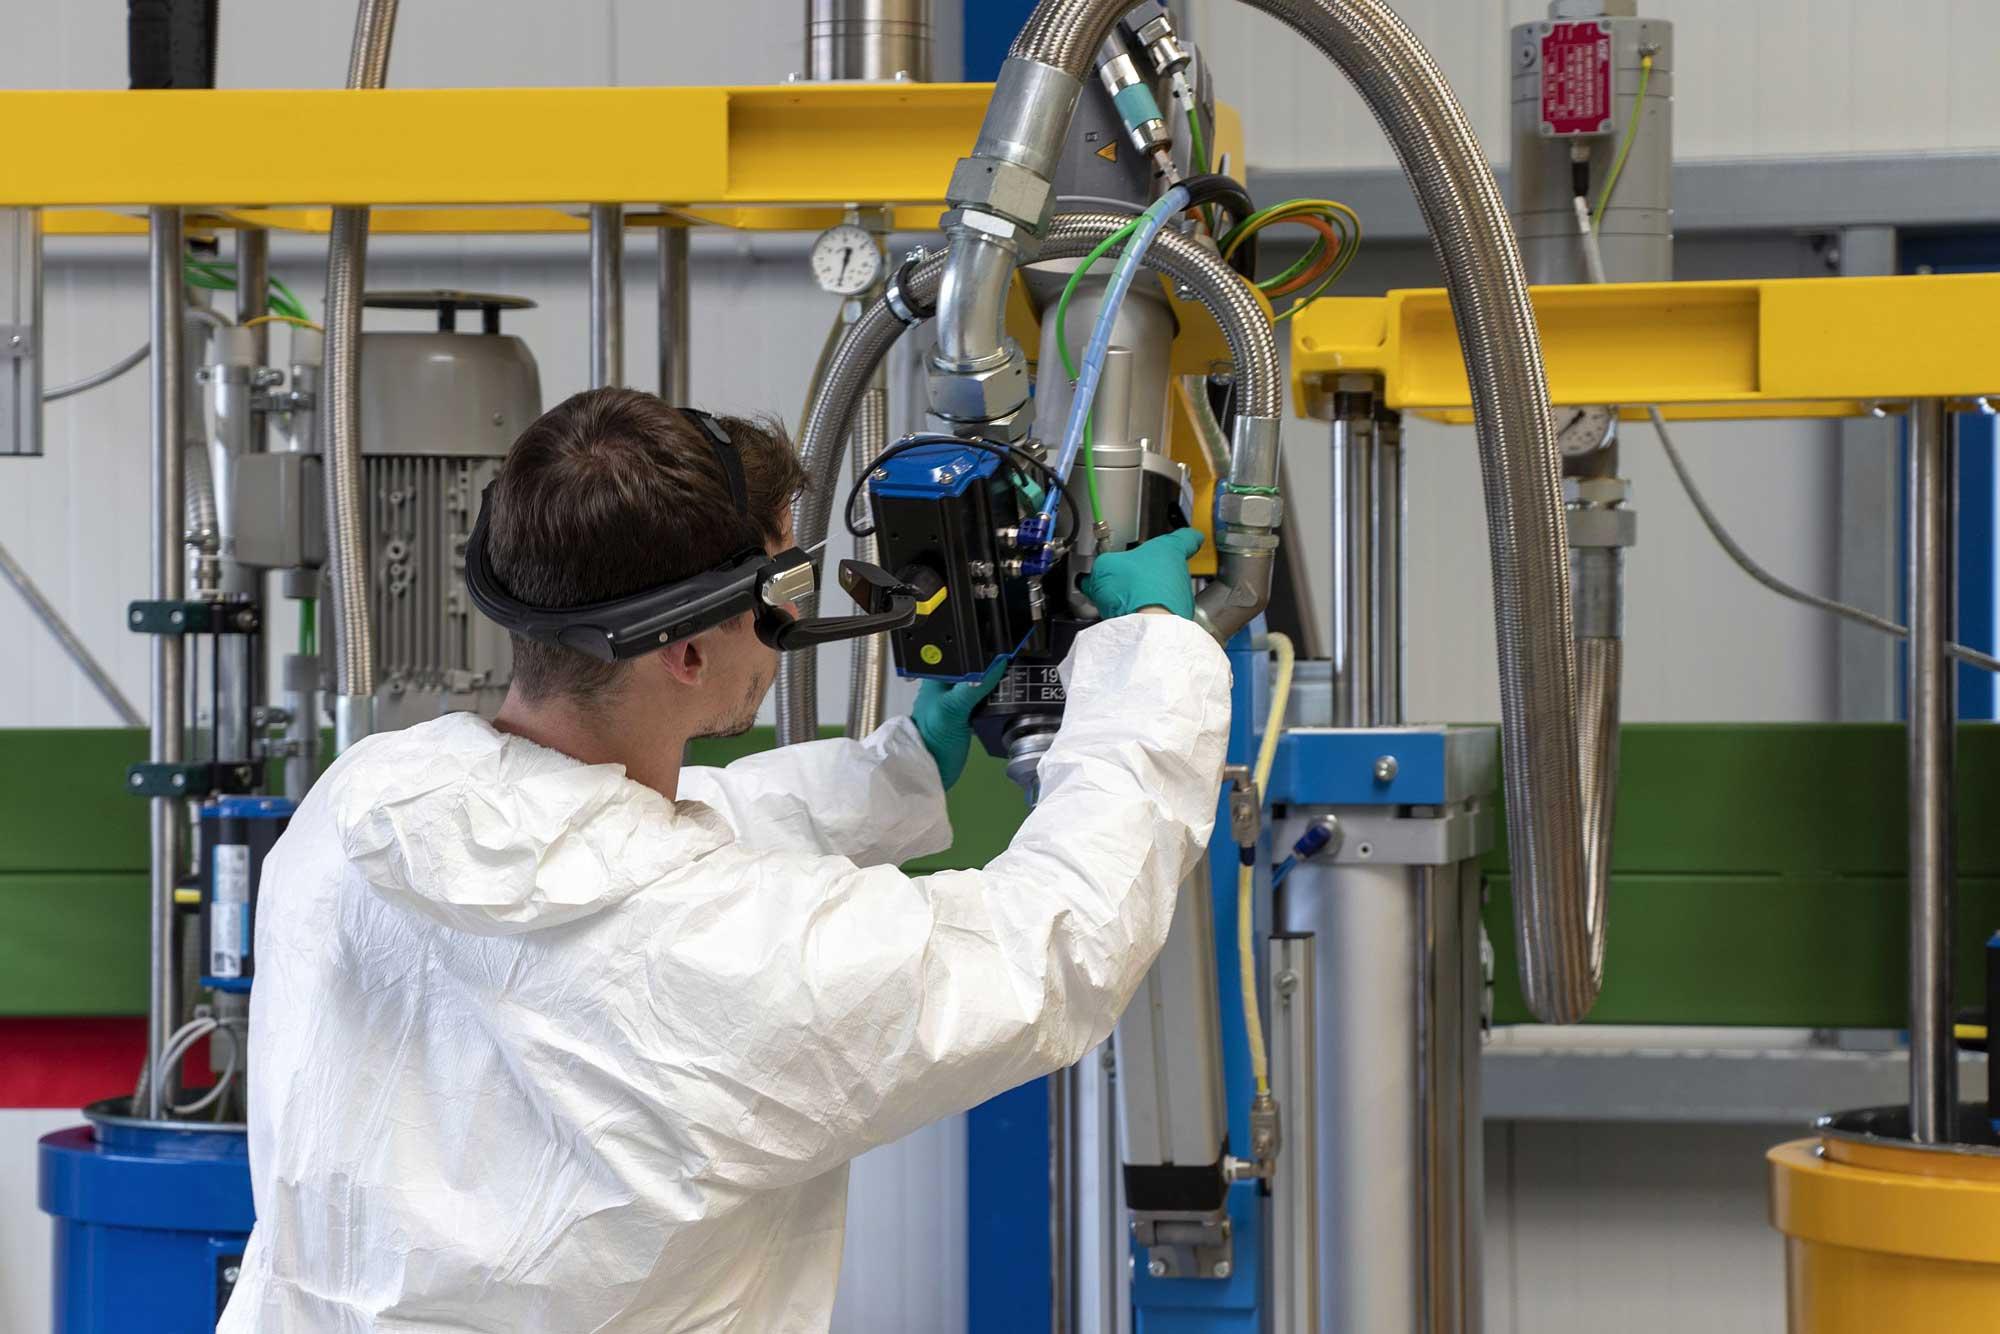 service technician shows plant via smartglass